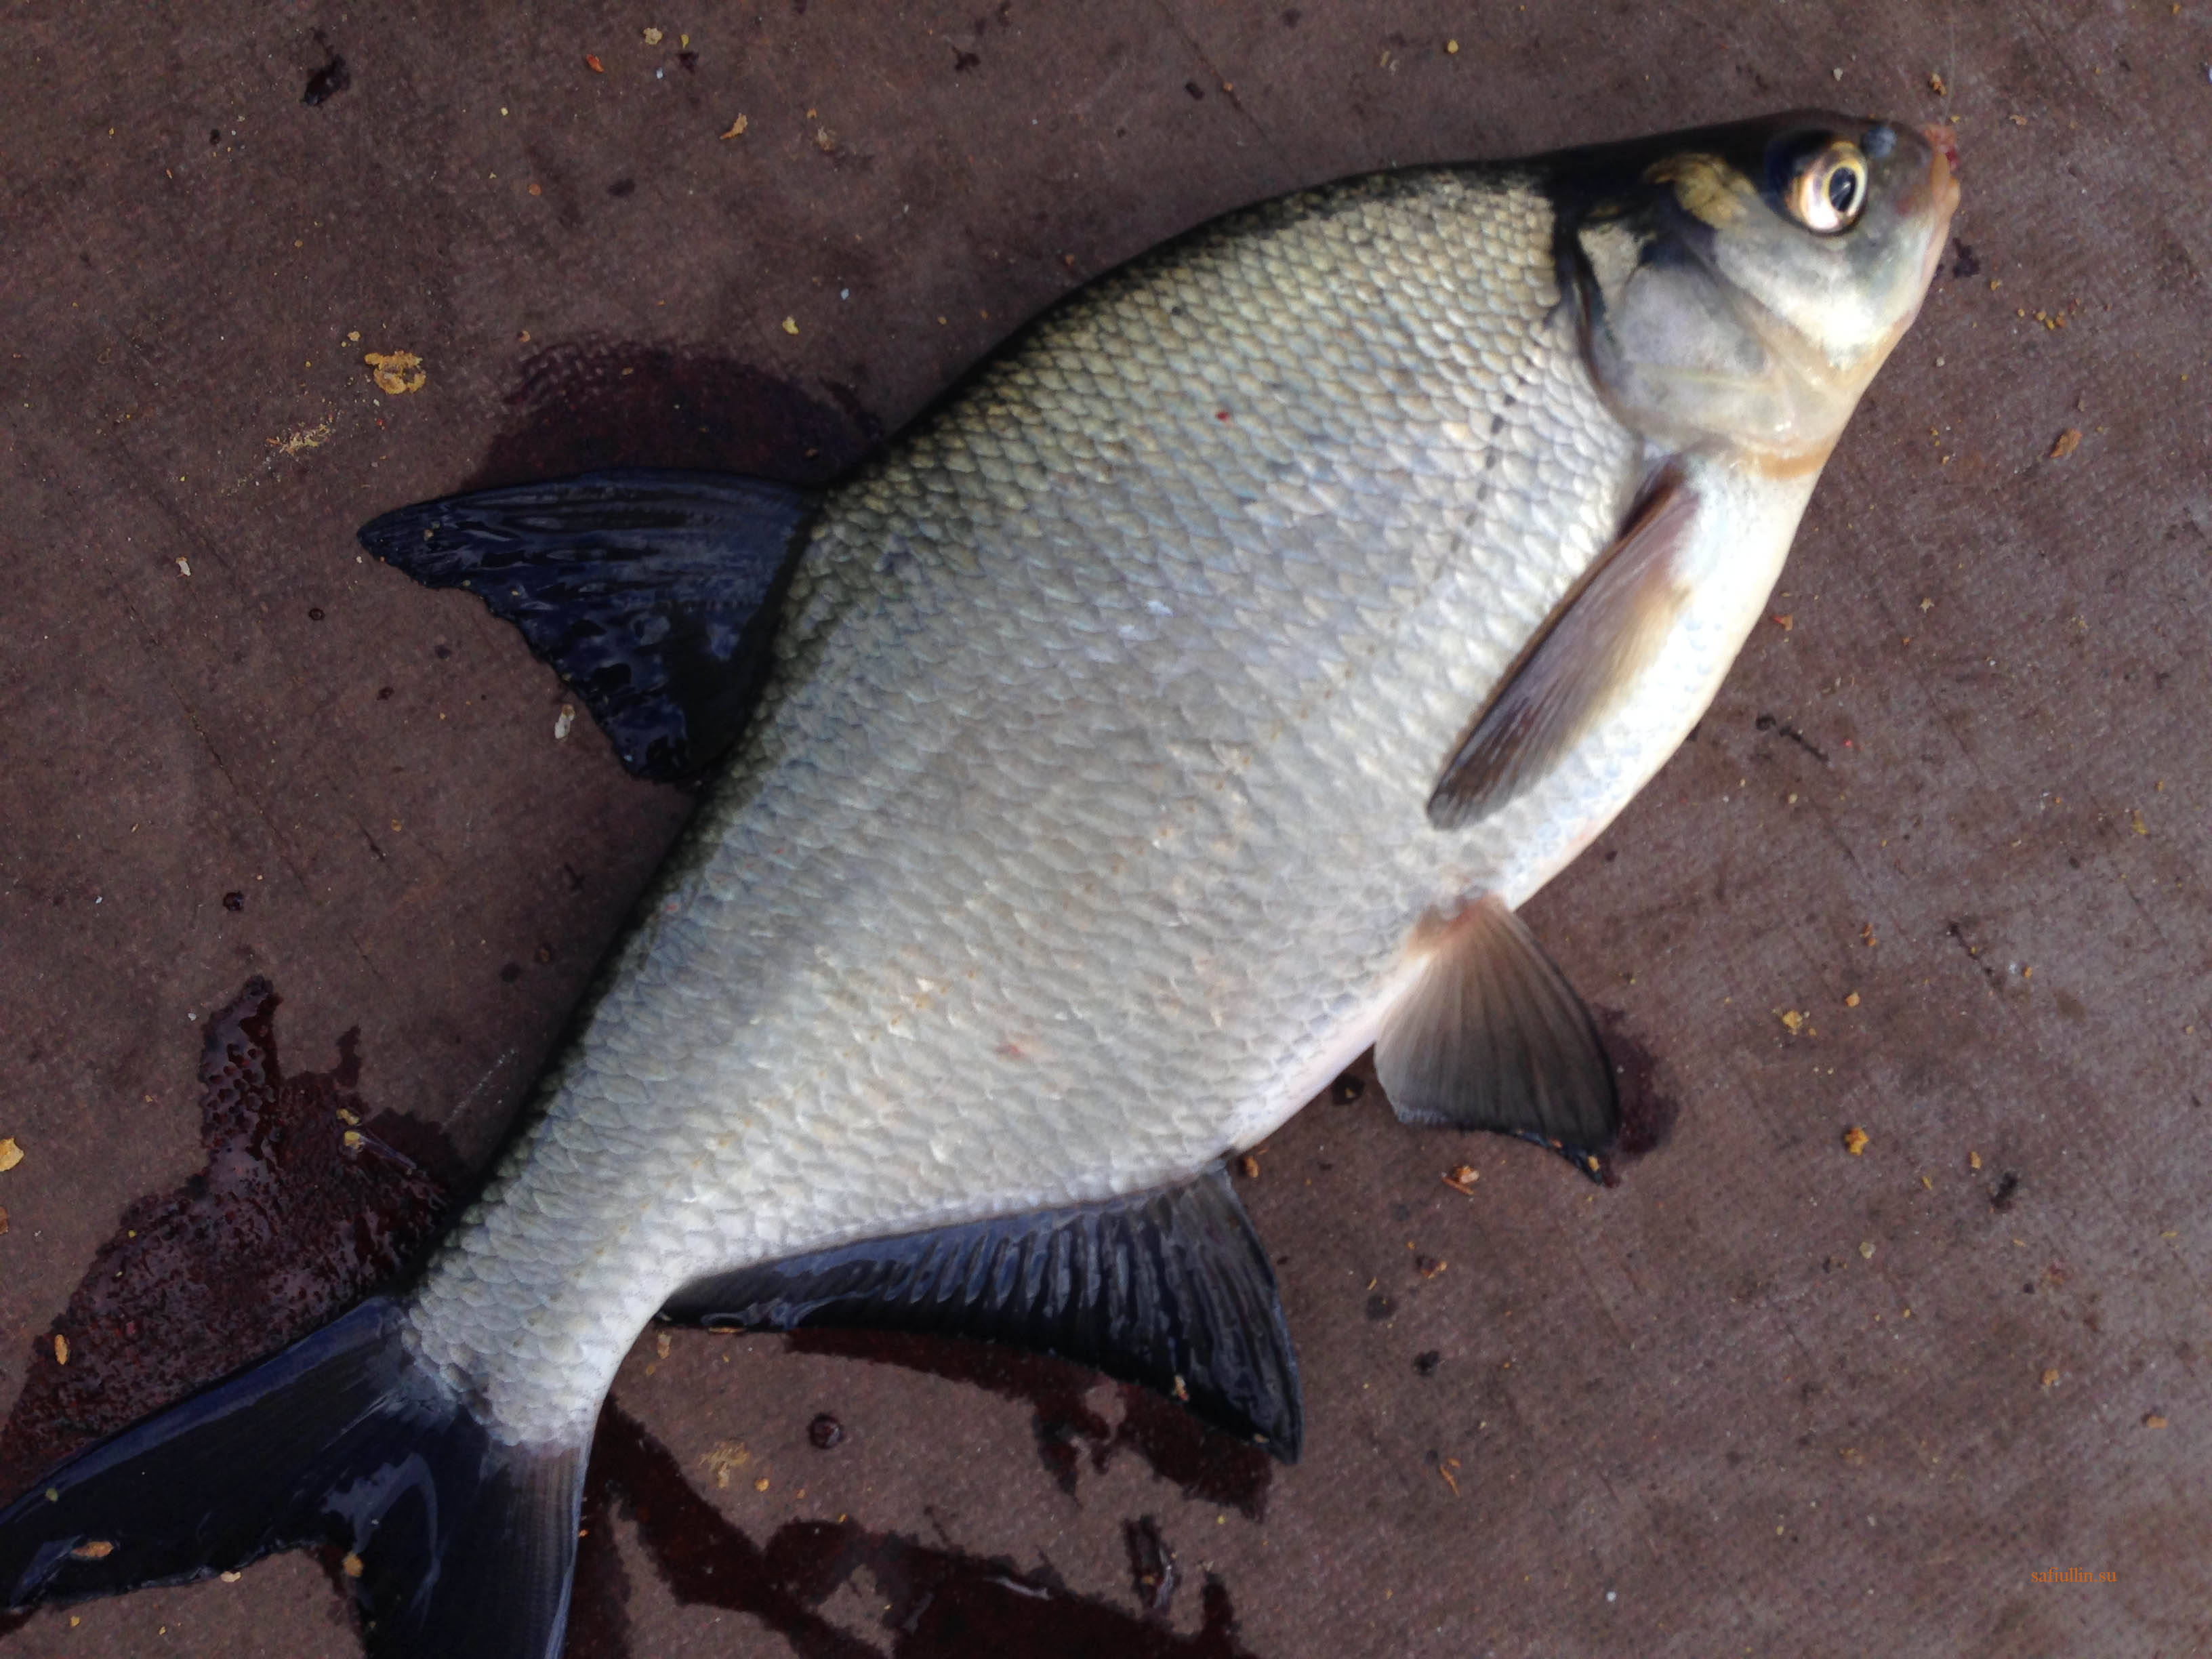 пейзажи природы альберт сафиуллин лето лещ река Лиелупе рыбалка